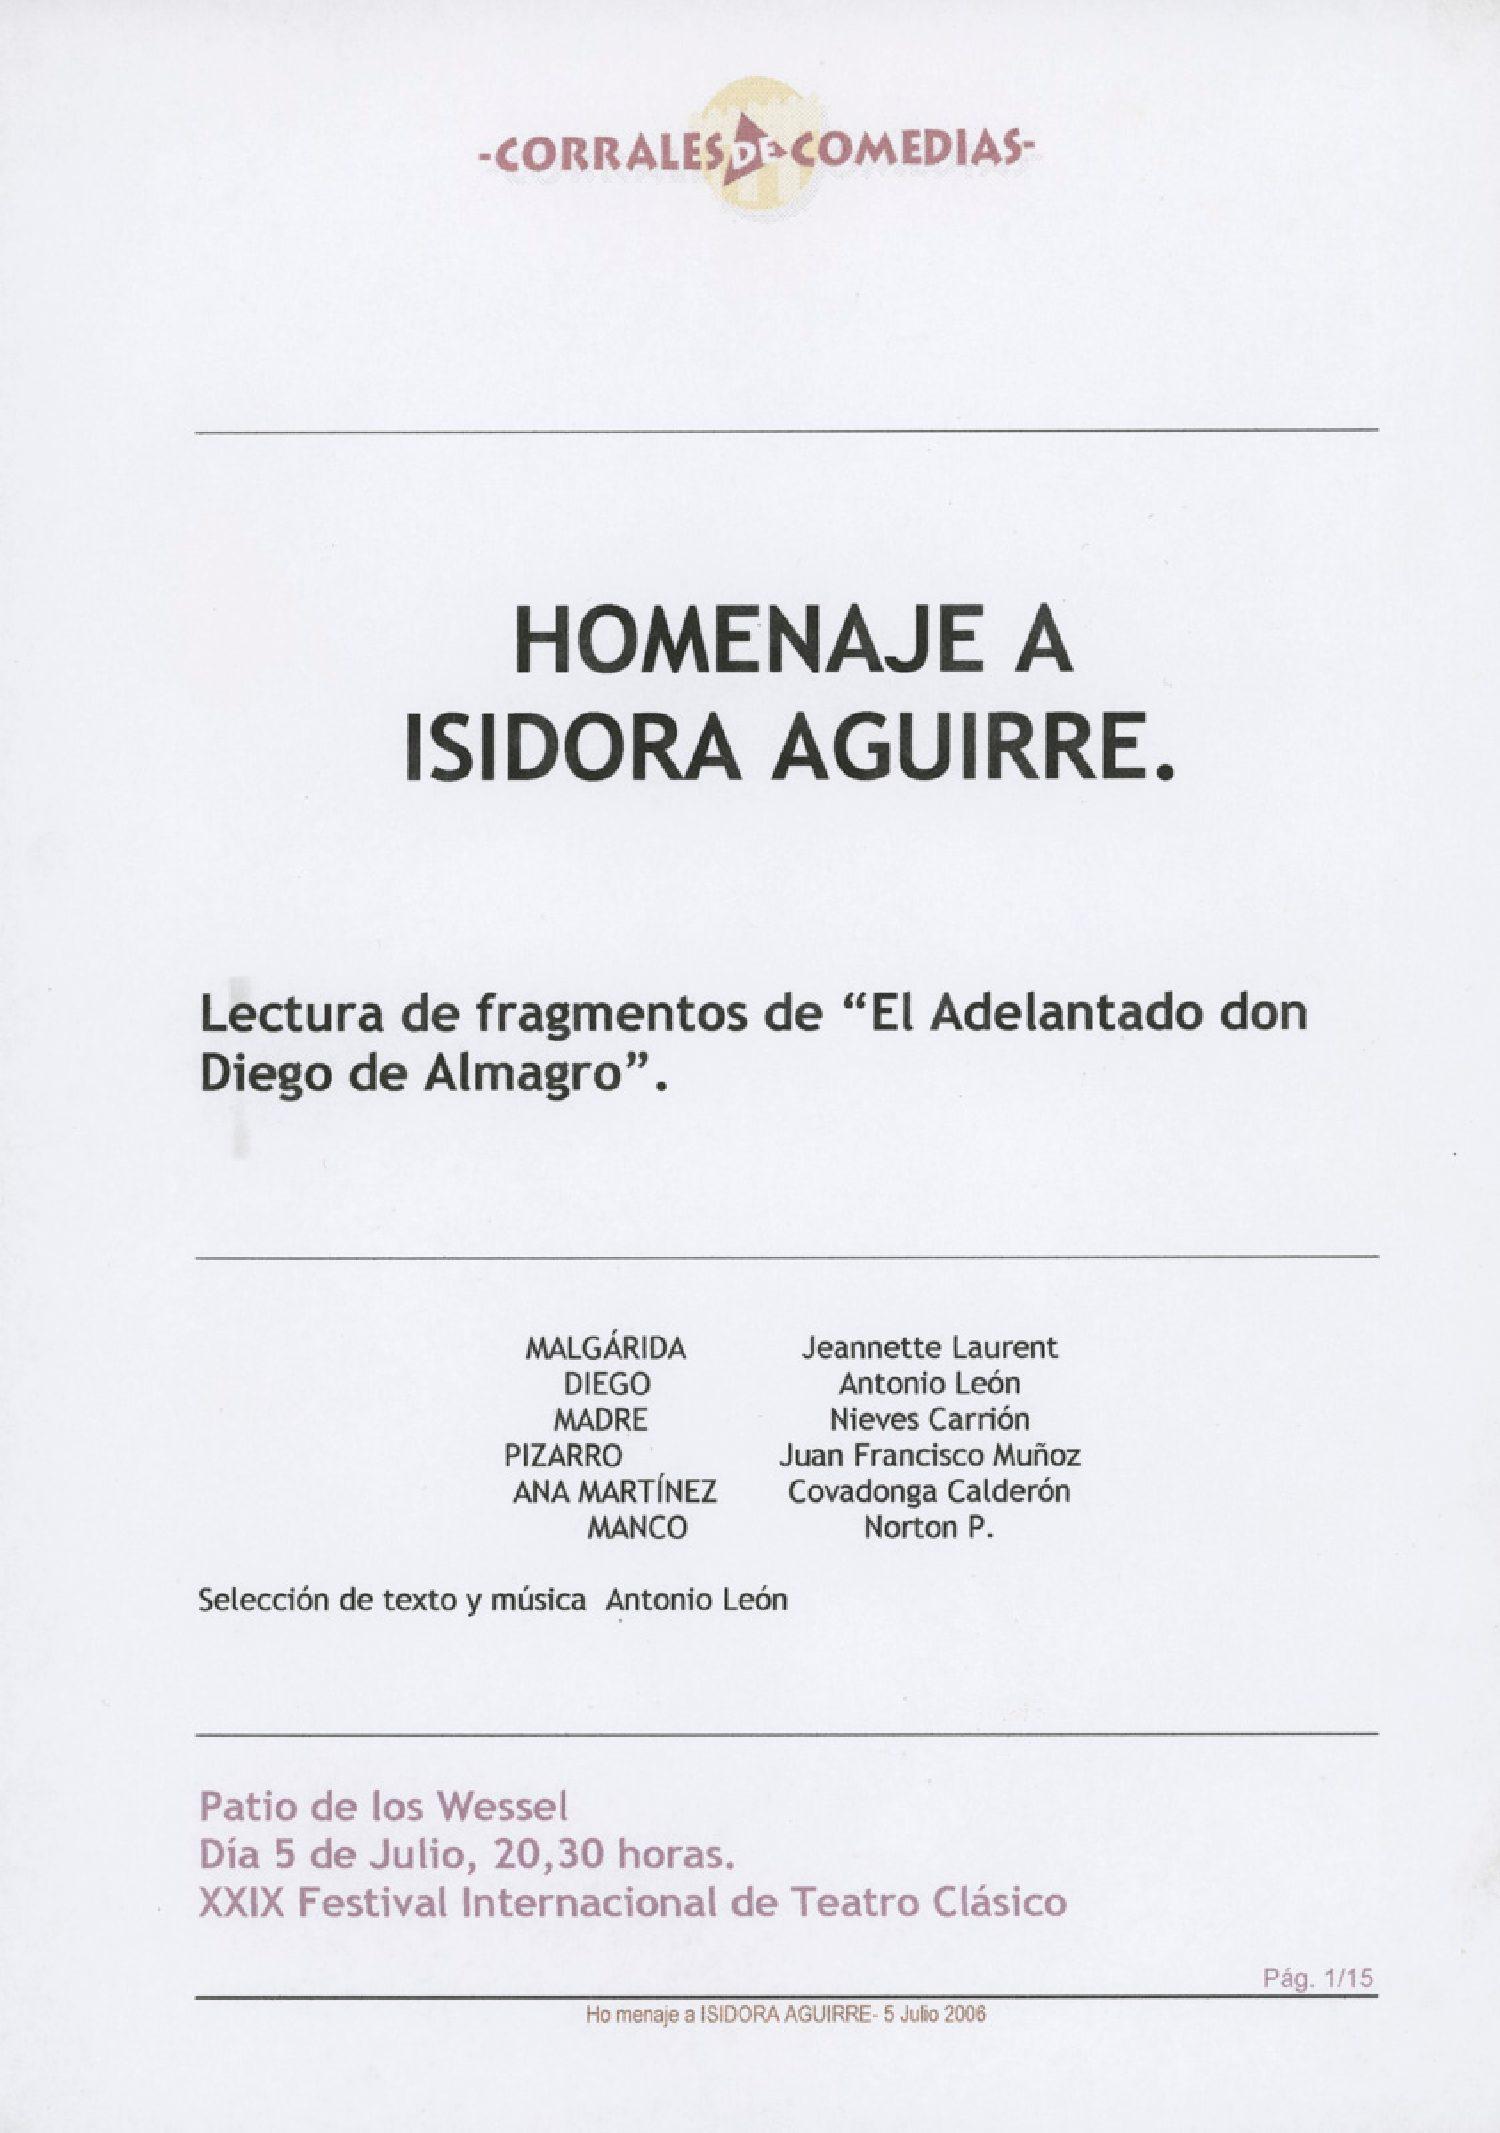 IA-022-004-001